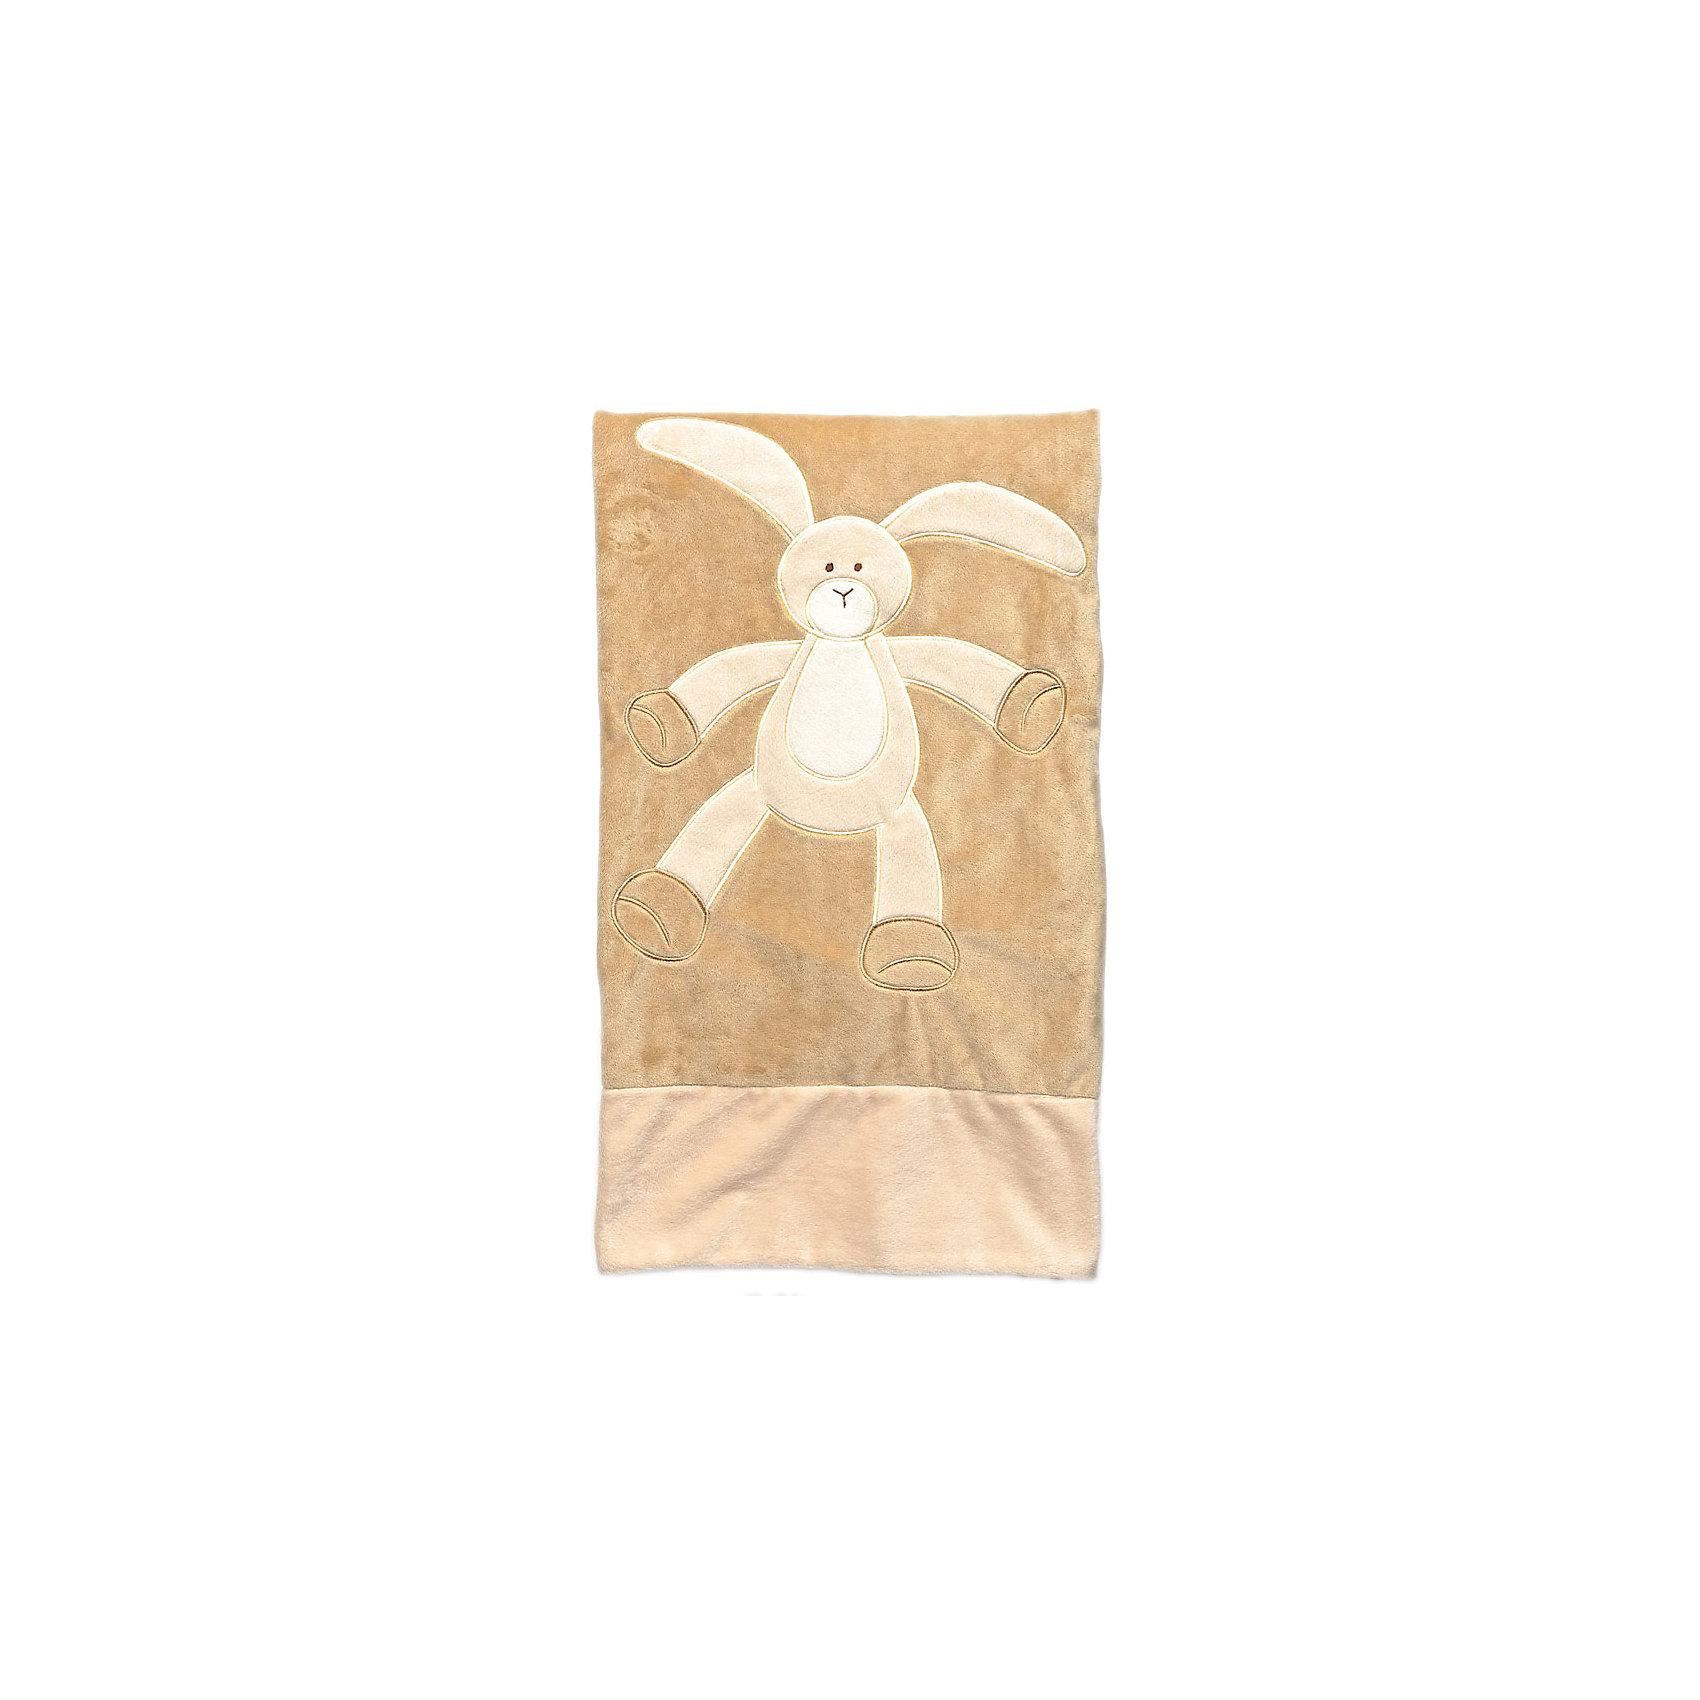 Teddykompaniet Плед велюр 80х80 Кролик , Динглисар, Teddykompaniet